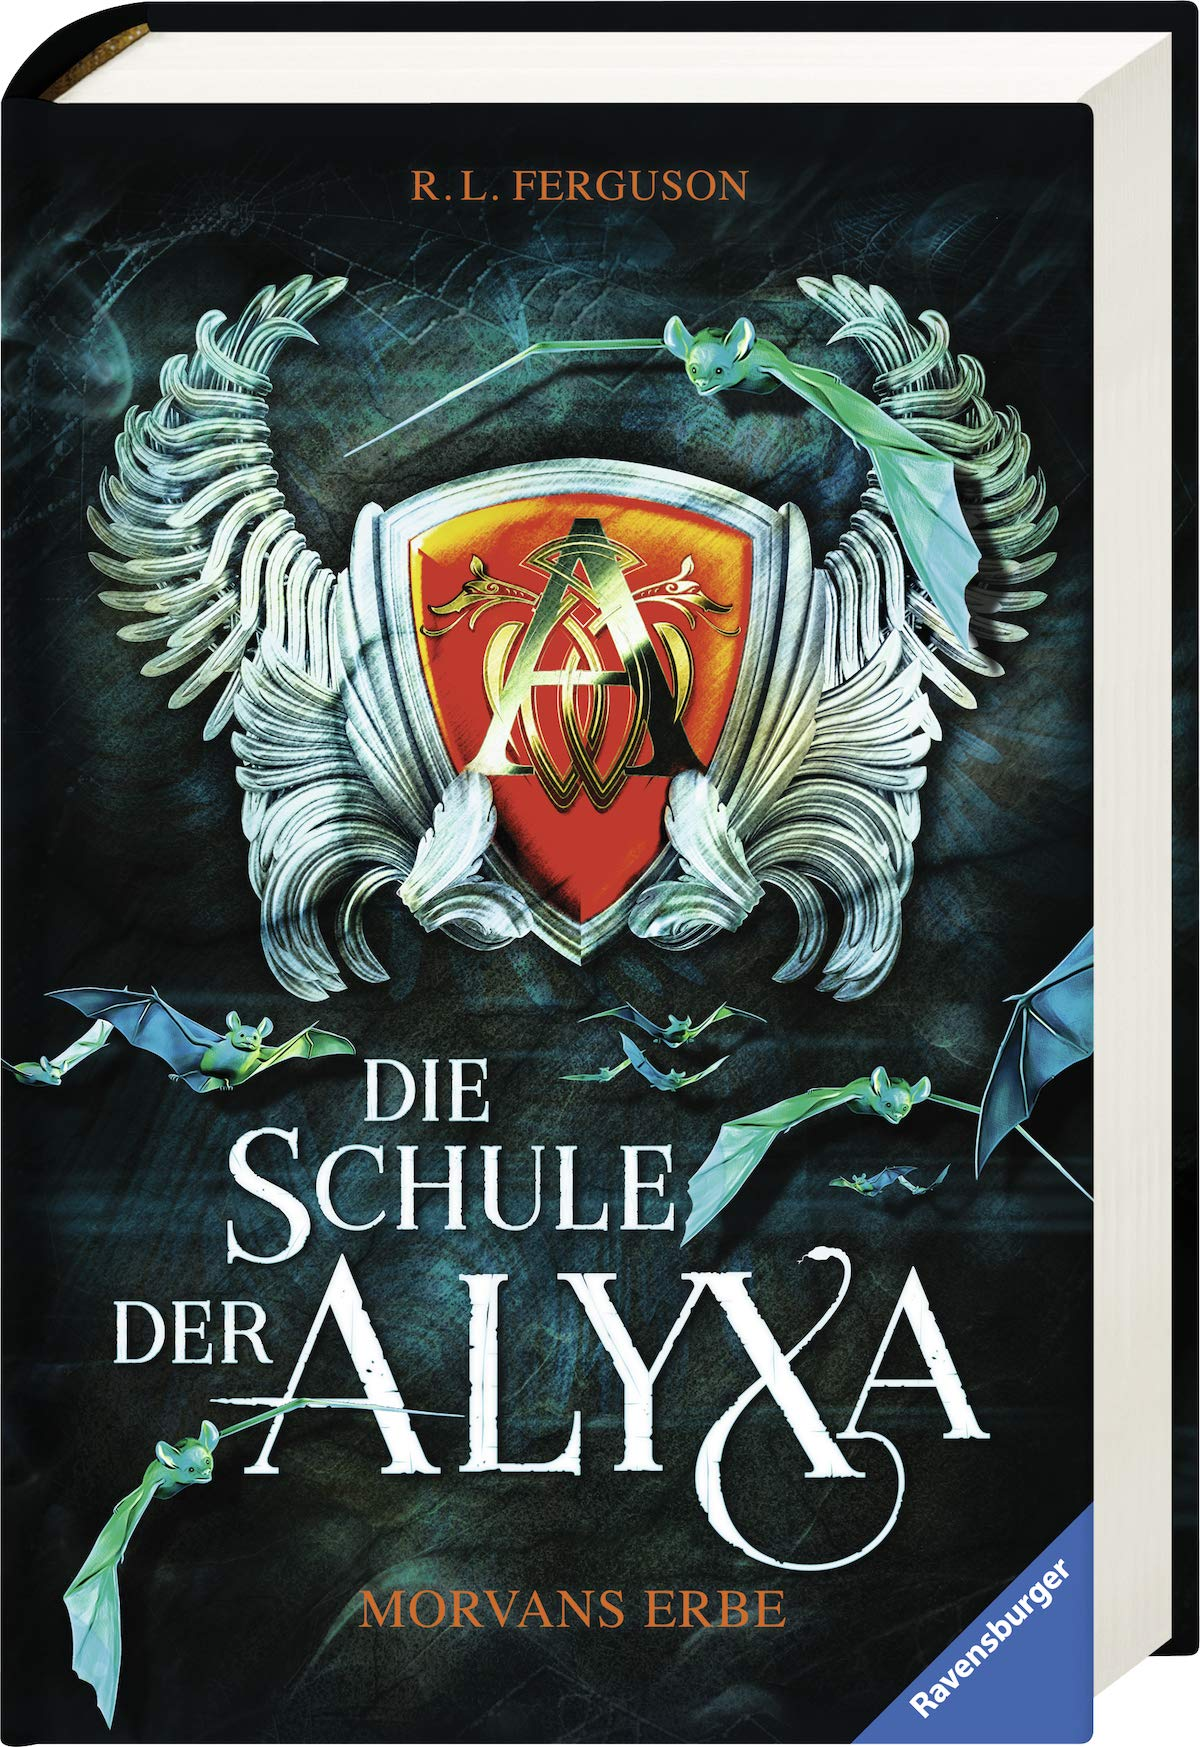 Die Schule der Alyxa, Band 2: Morvans Erbe Gebundenes Buch – 1. Februar 2019 R. L. Ferguson Leo Strohm Ravensburger Buchverlag 3473408298